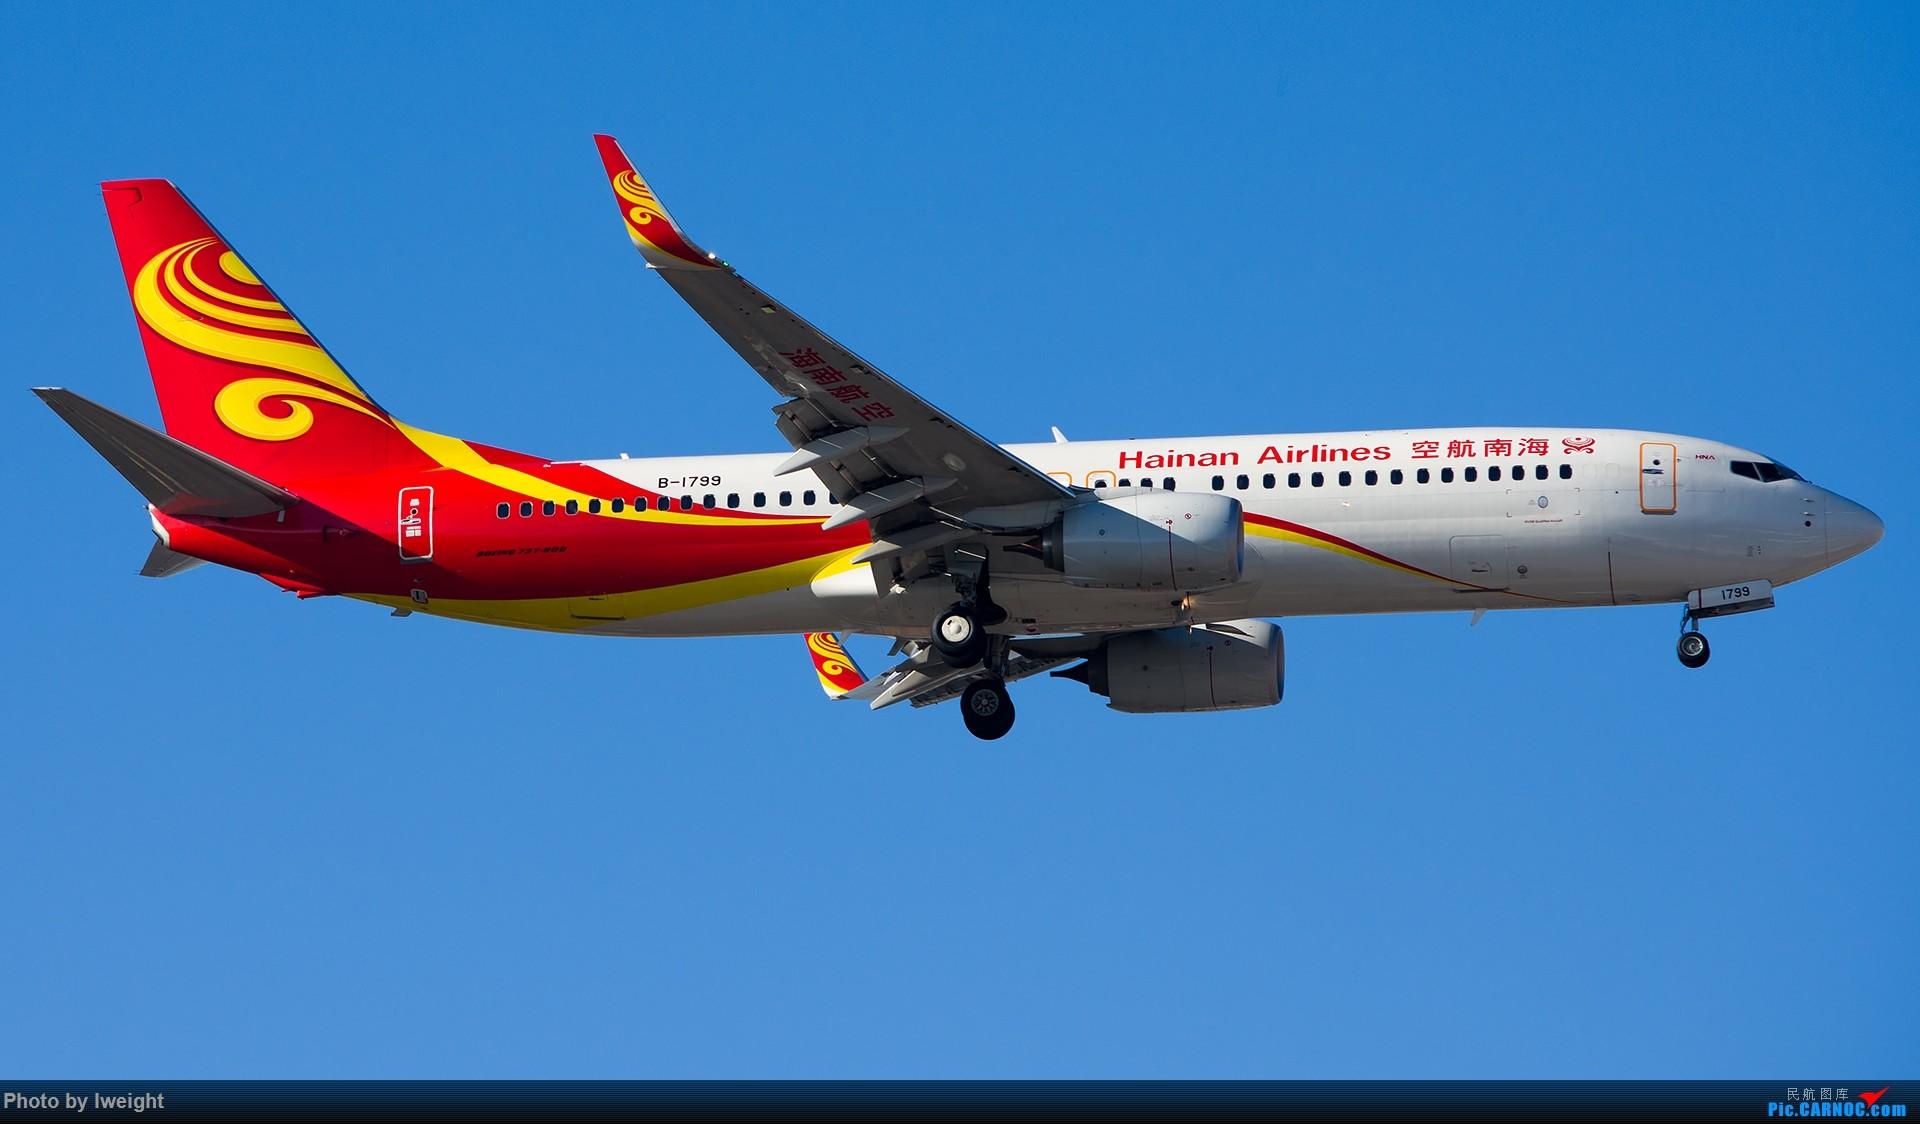 Re:[原创]终于在12月的北京等到了一个晴天的周末,出来拍拍飞机【2015-12-5】 BOEING 737-800 B-1799 中国北京首都国际机场